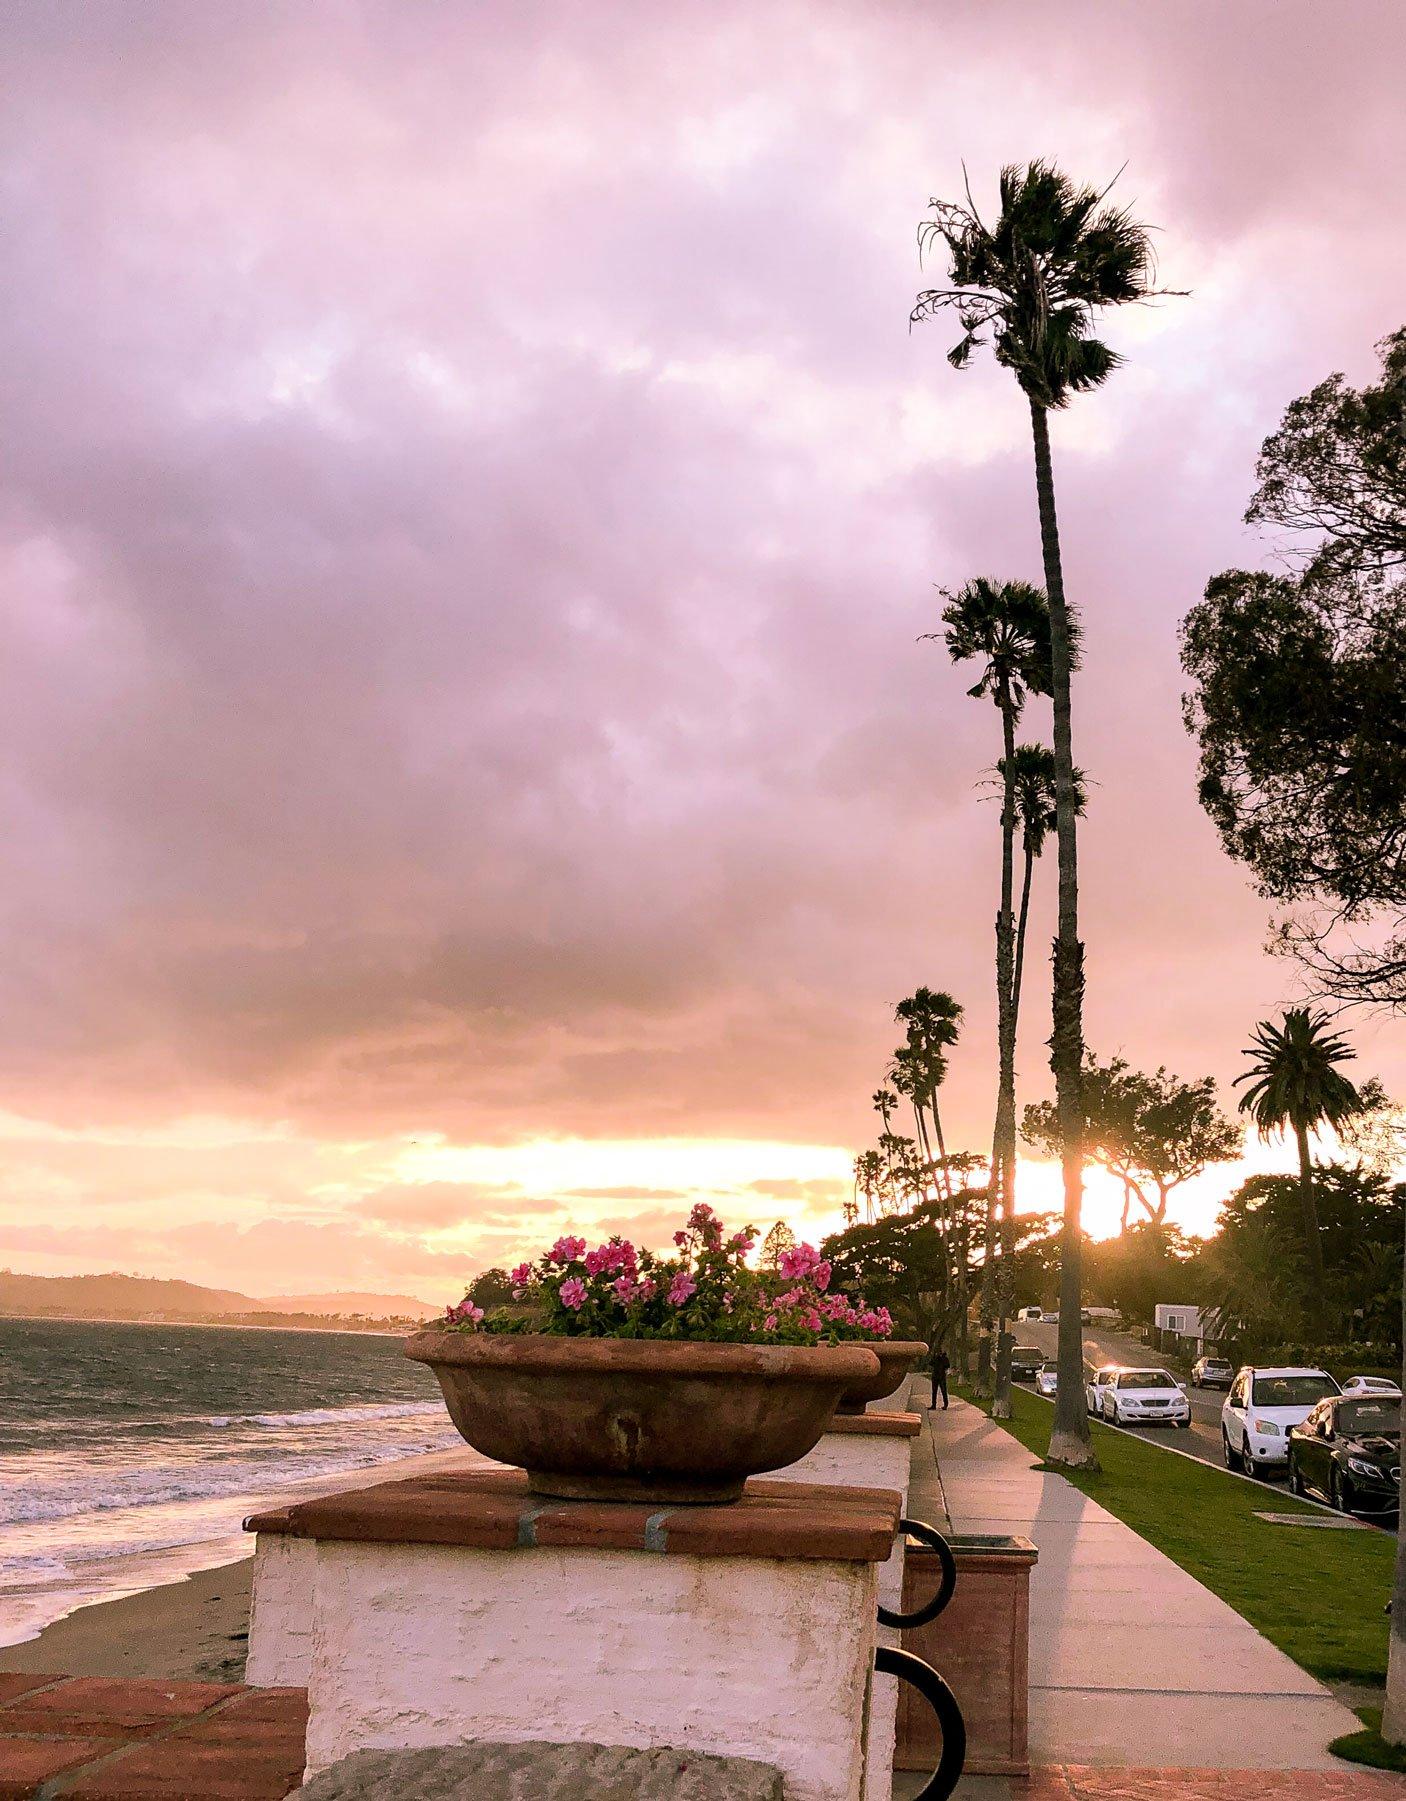 Sunset at butterfly beach Santa Barbara